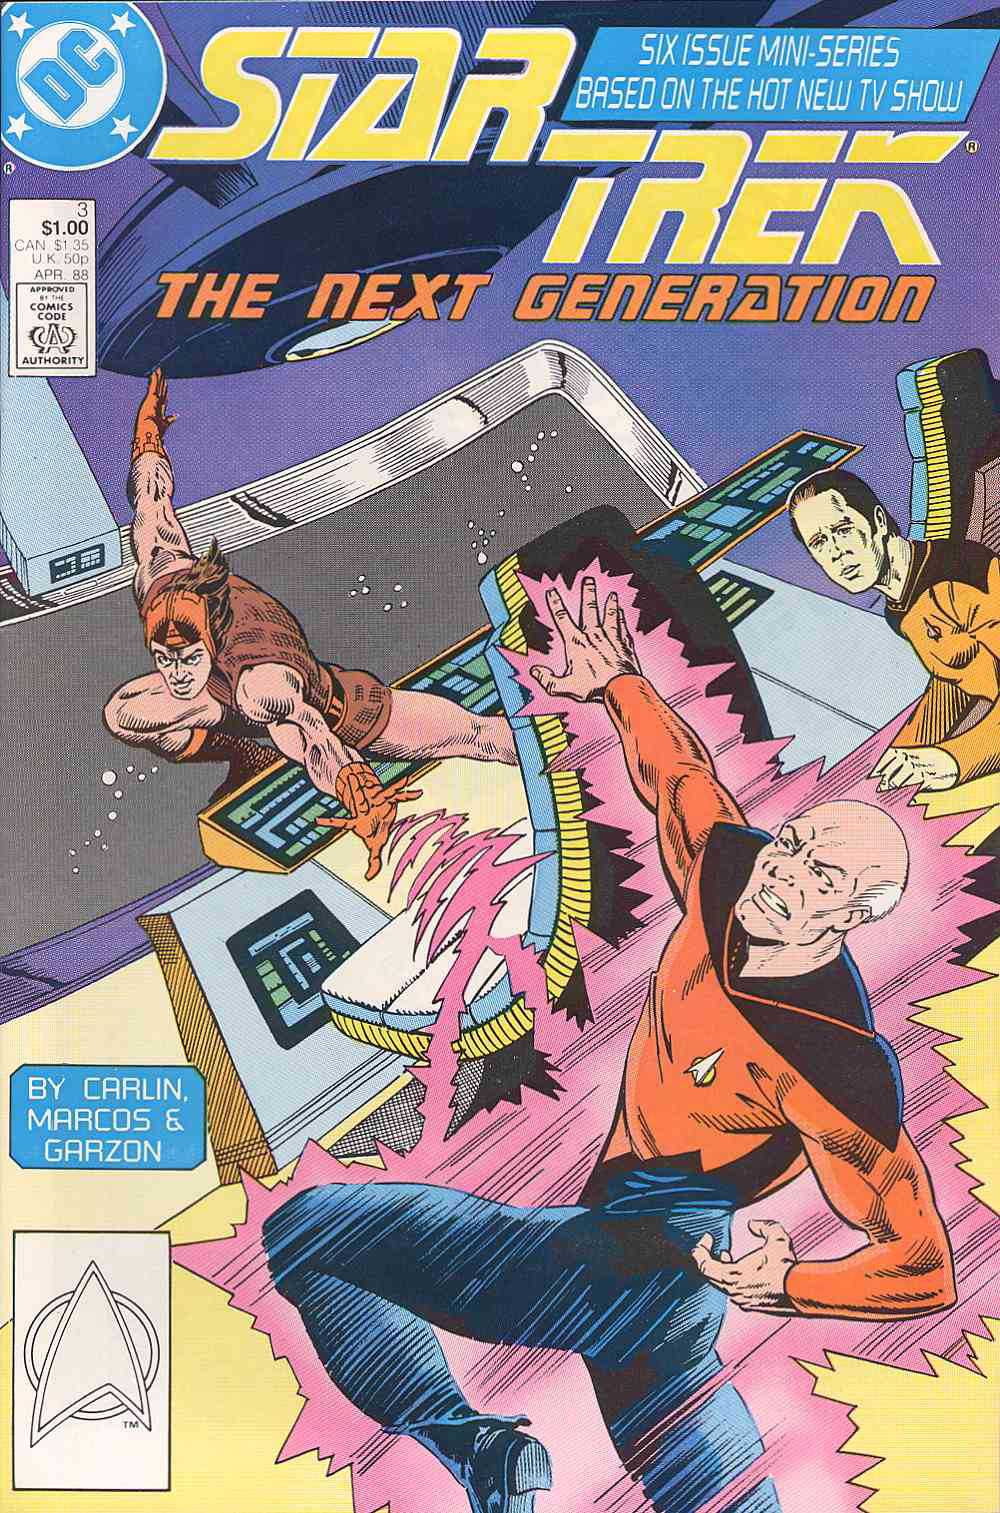 Star Trek: The Next Generation (1988) issue 3 - Page 1